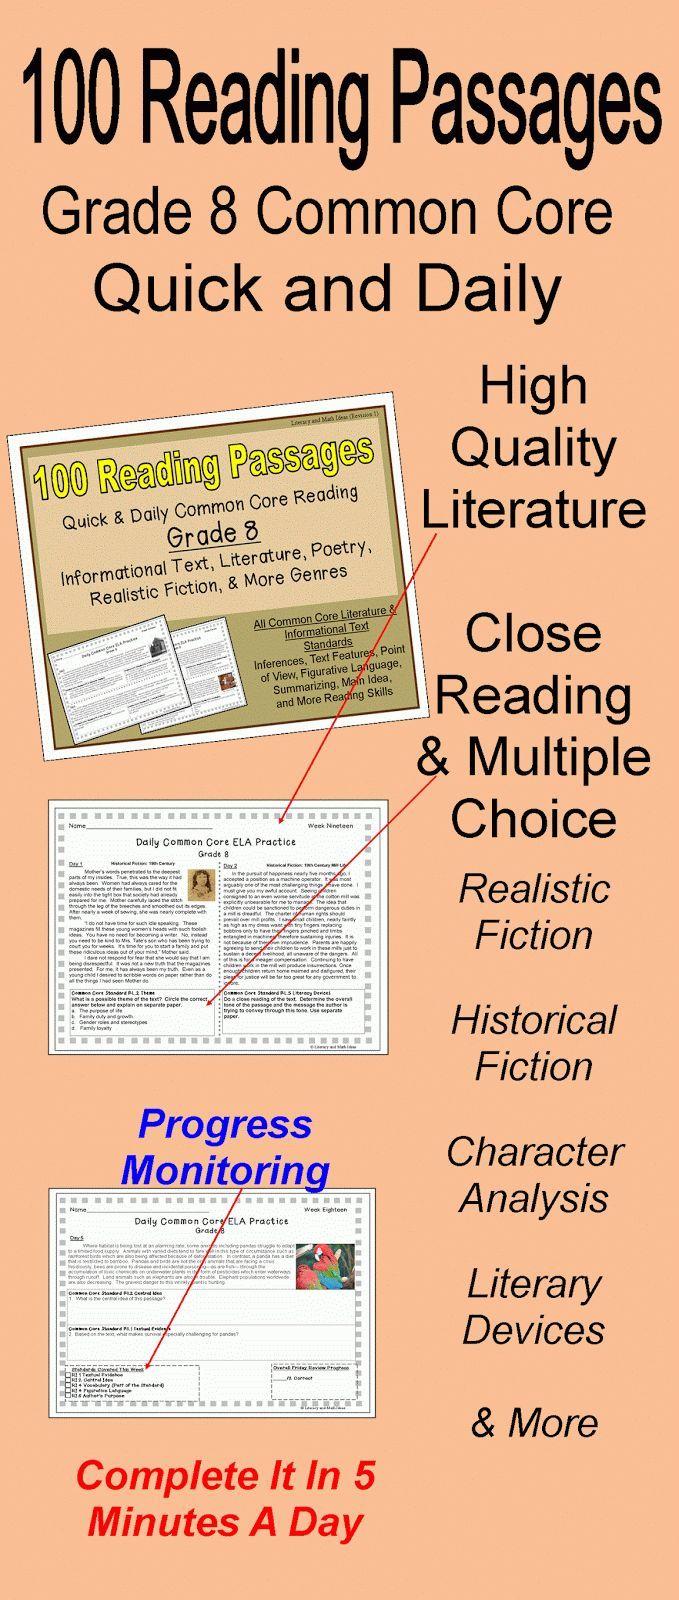 best ideas about cv original word cv original professional creative resume template for ms word modern resume design cv template design instant digital anna